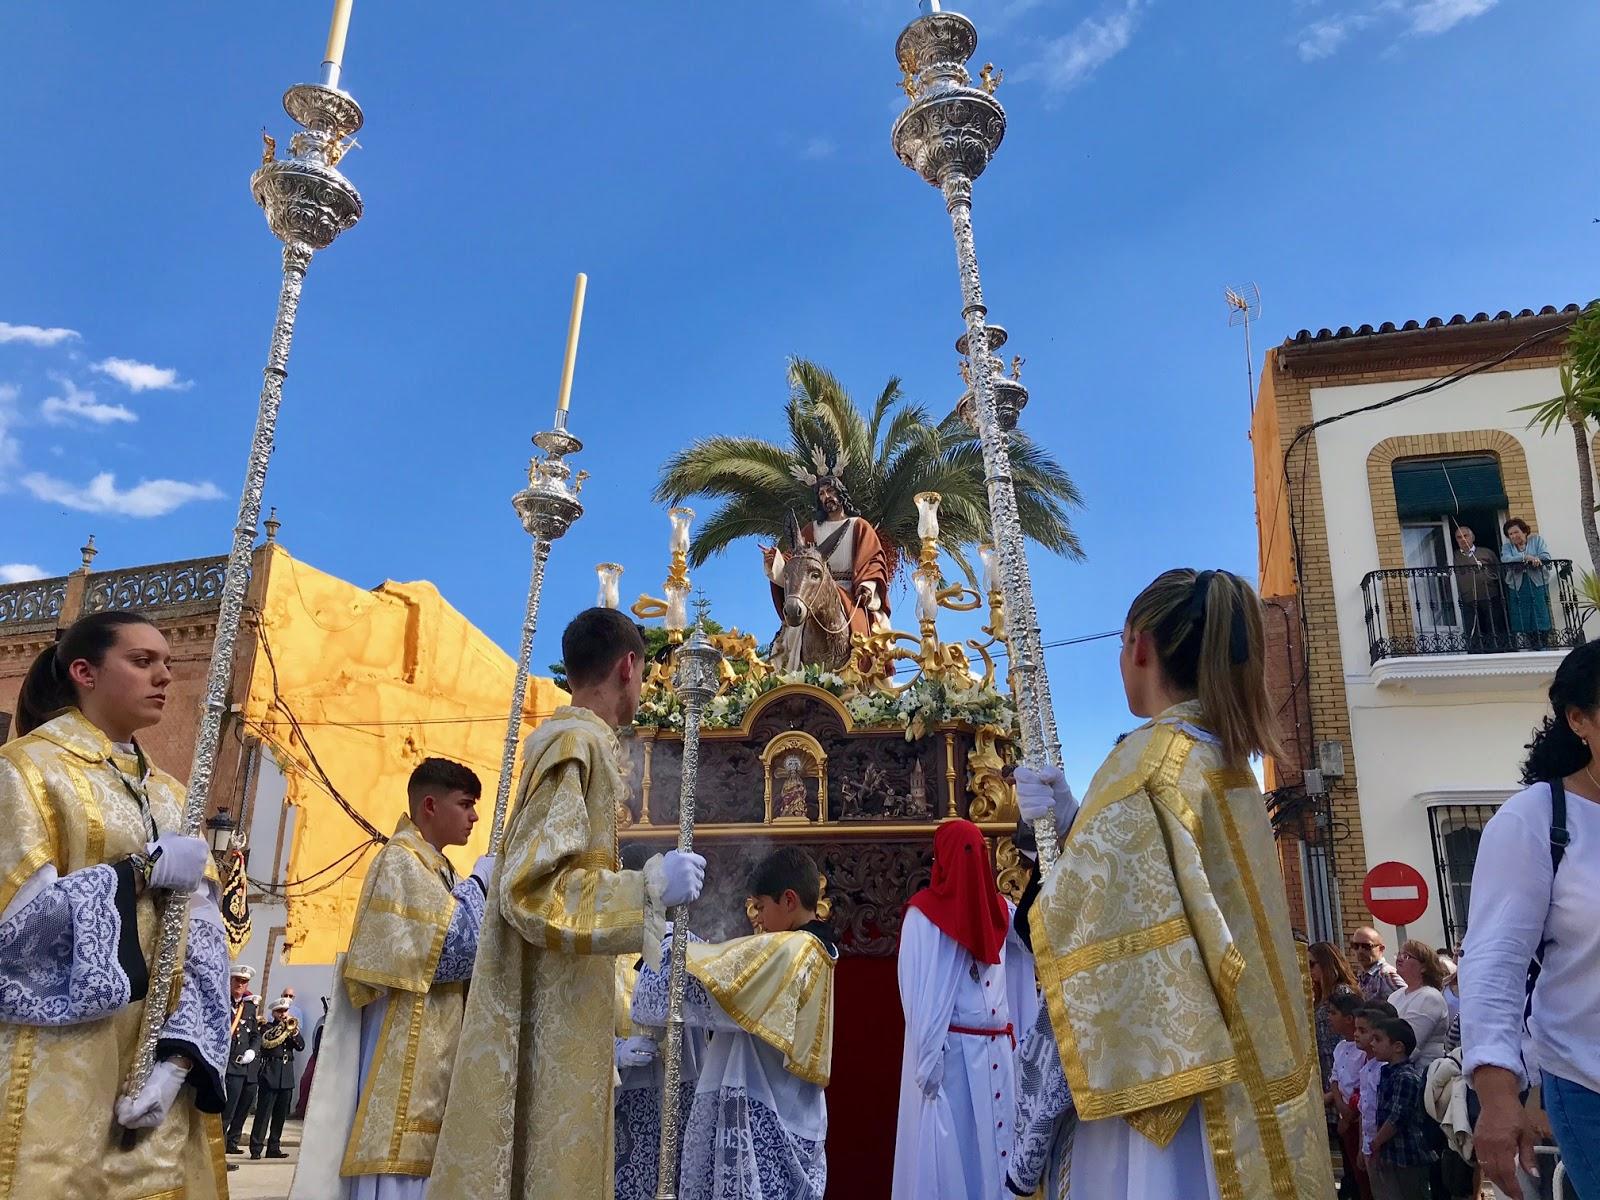 http://www.esvalverde.com/2019/04/procesion-de-la-borriquita-19.html